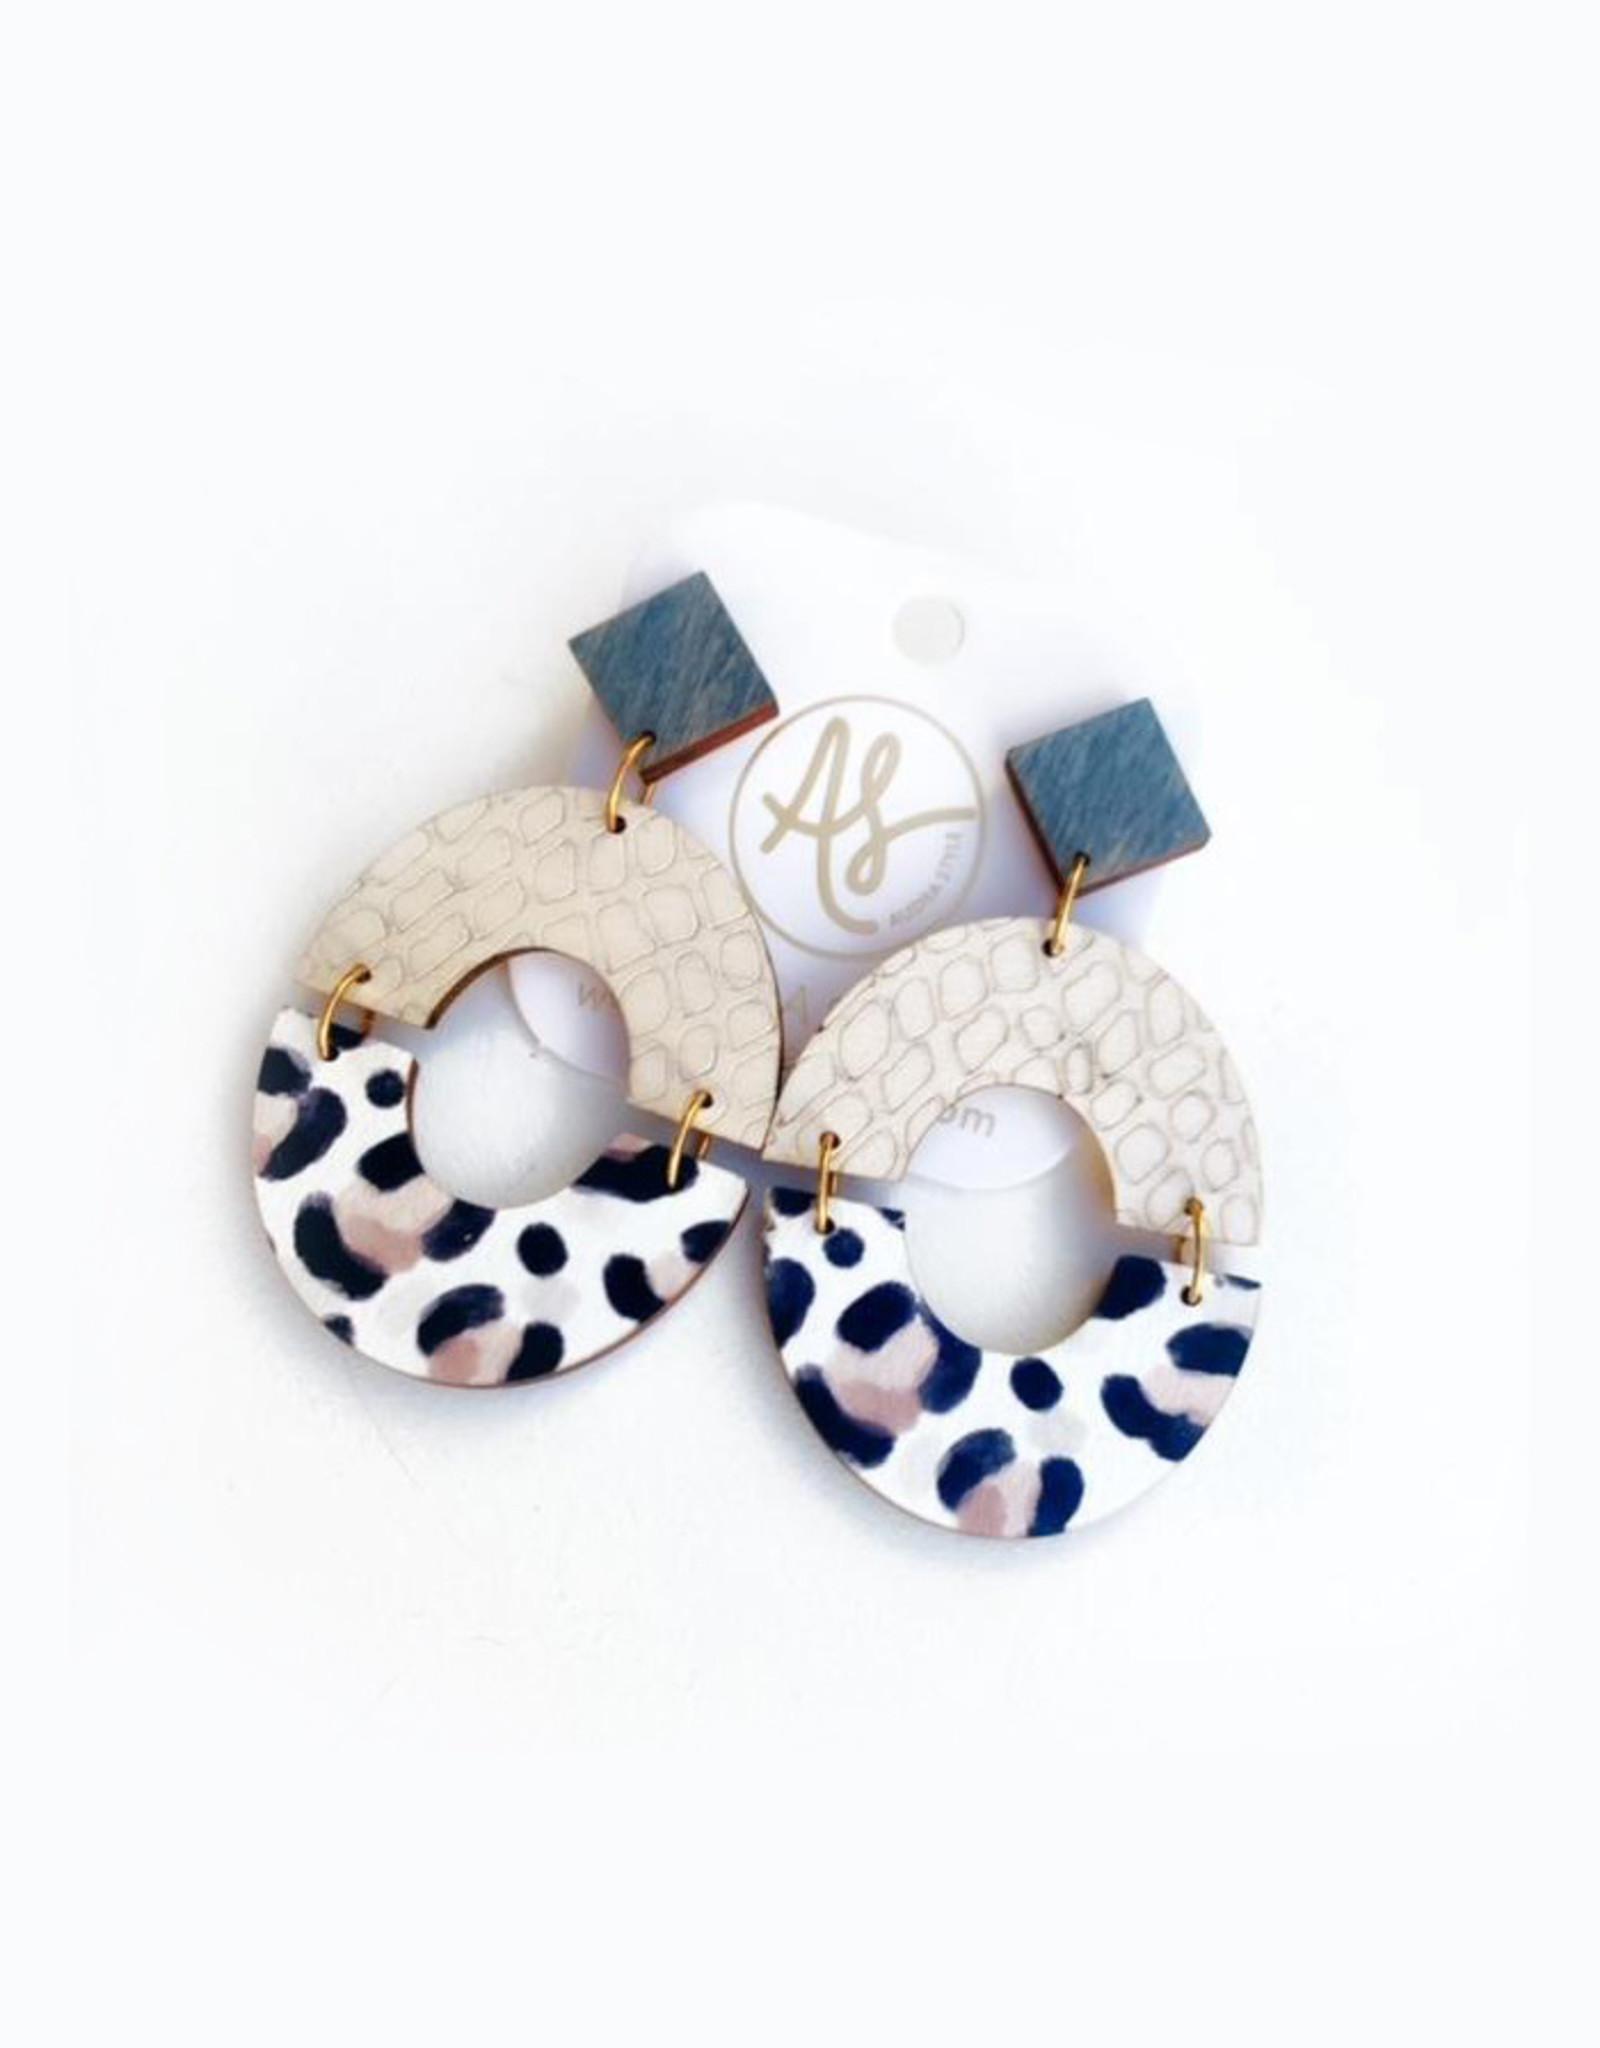 Audra Style Amanda Earrings - Taupe Cheetah